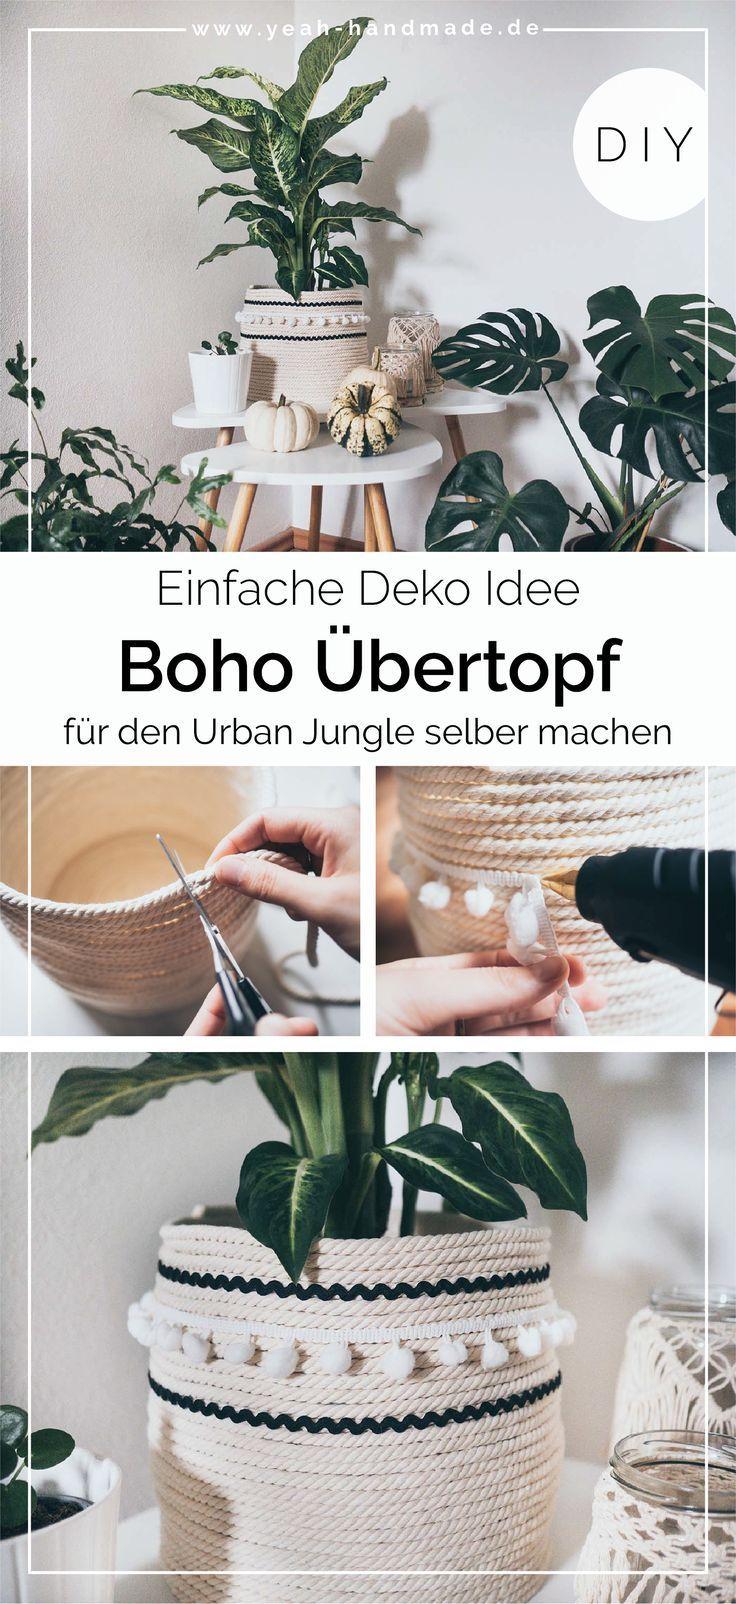 Photo of DIY boho planter make yourself • Yeah Handmade – My Blog